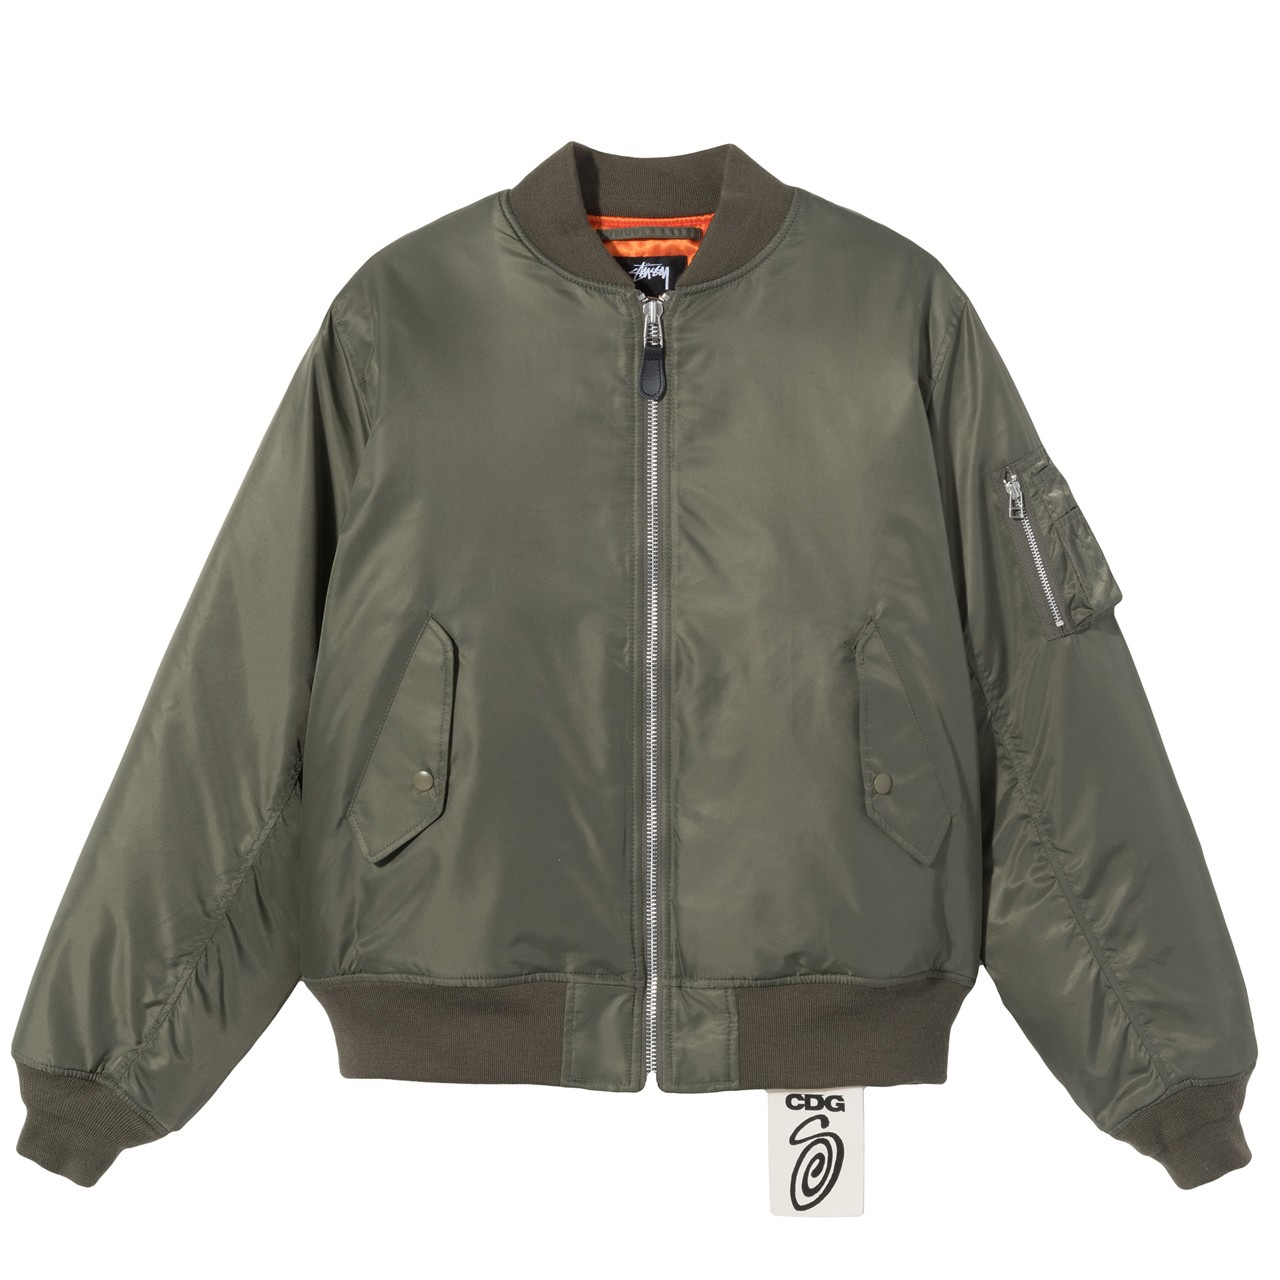 Stussy x CDG bomber jacket